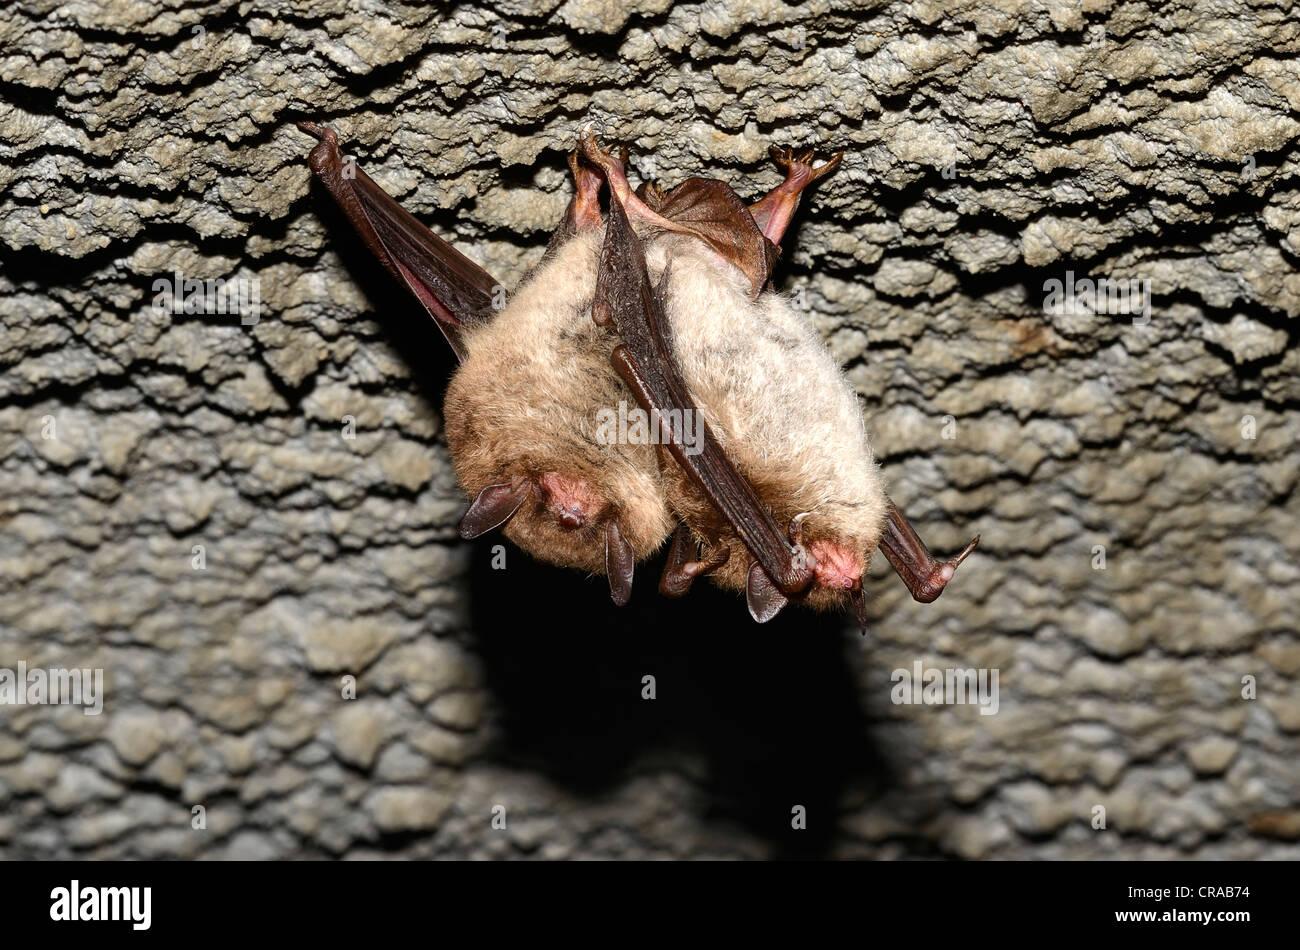 Daubenton's Bats (Myotis daubentoni), species in Annex IV of the Habitats Directive, in winter quarters, hibernating - Stock Image